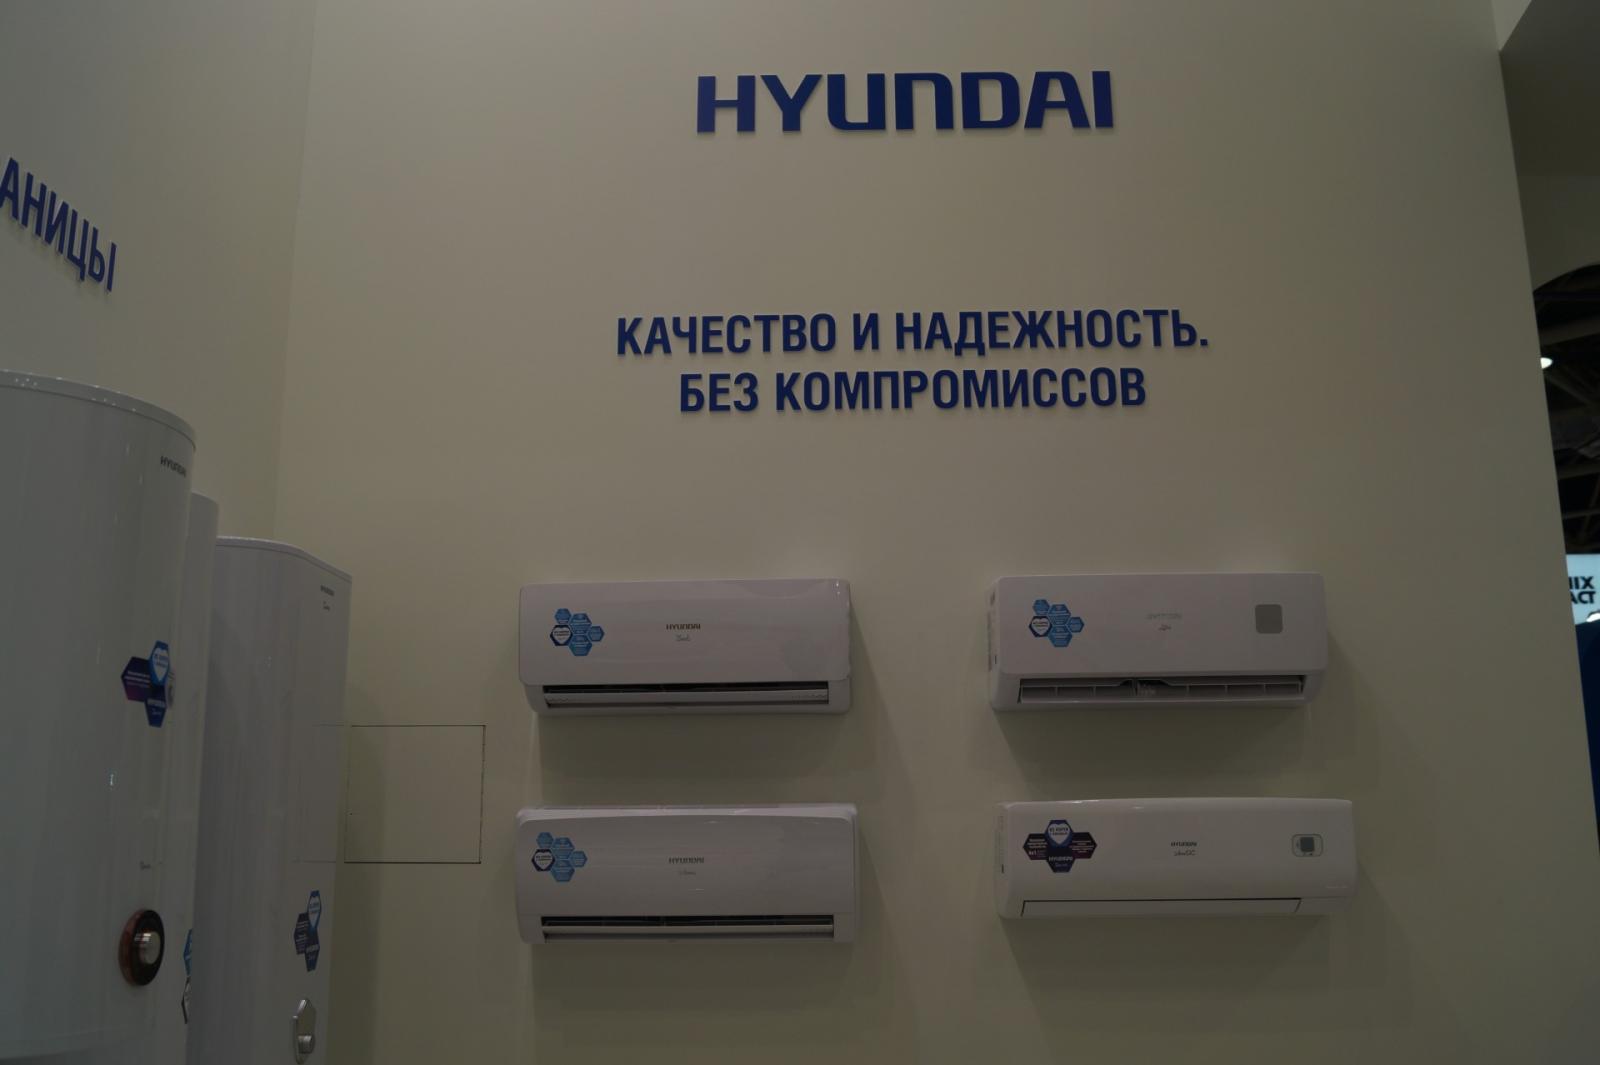 large.rejting-kondicionerov-po-nadezhnos